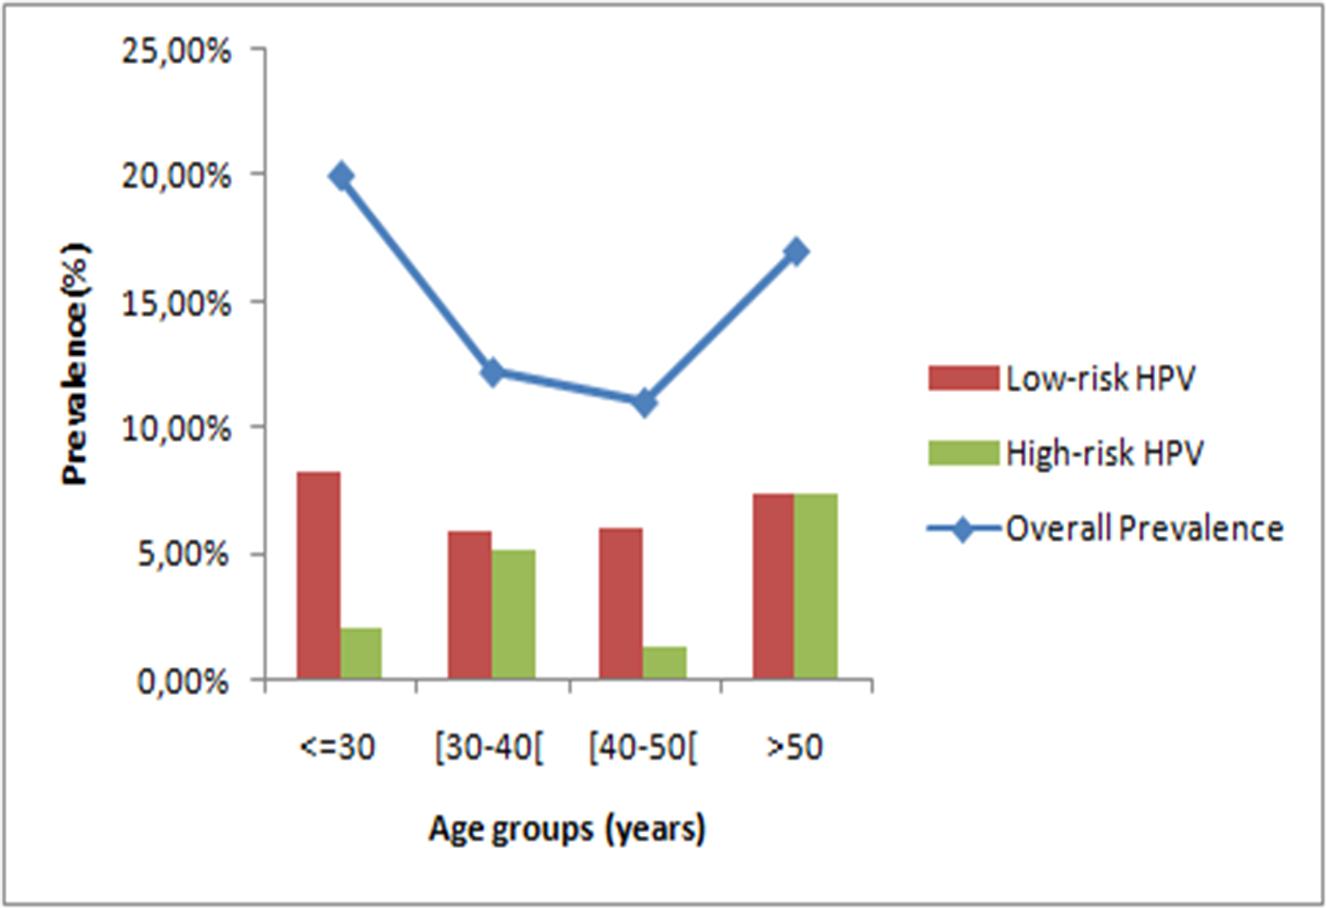 hpv high low risk qiagen la gi hpv virus rash